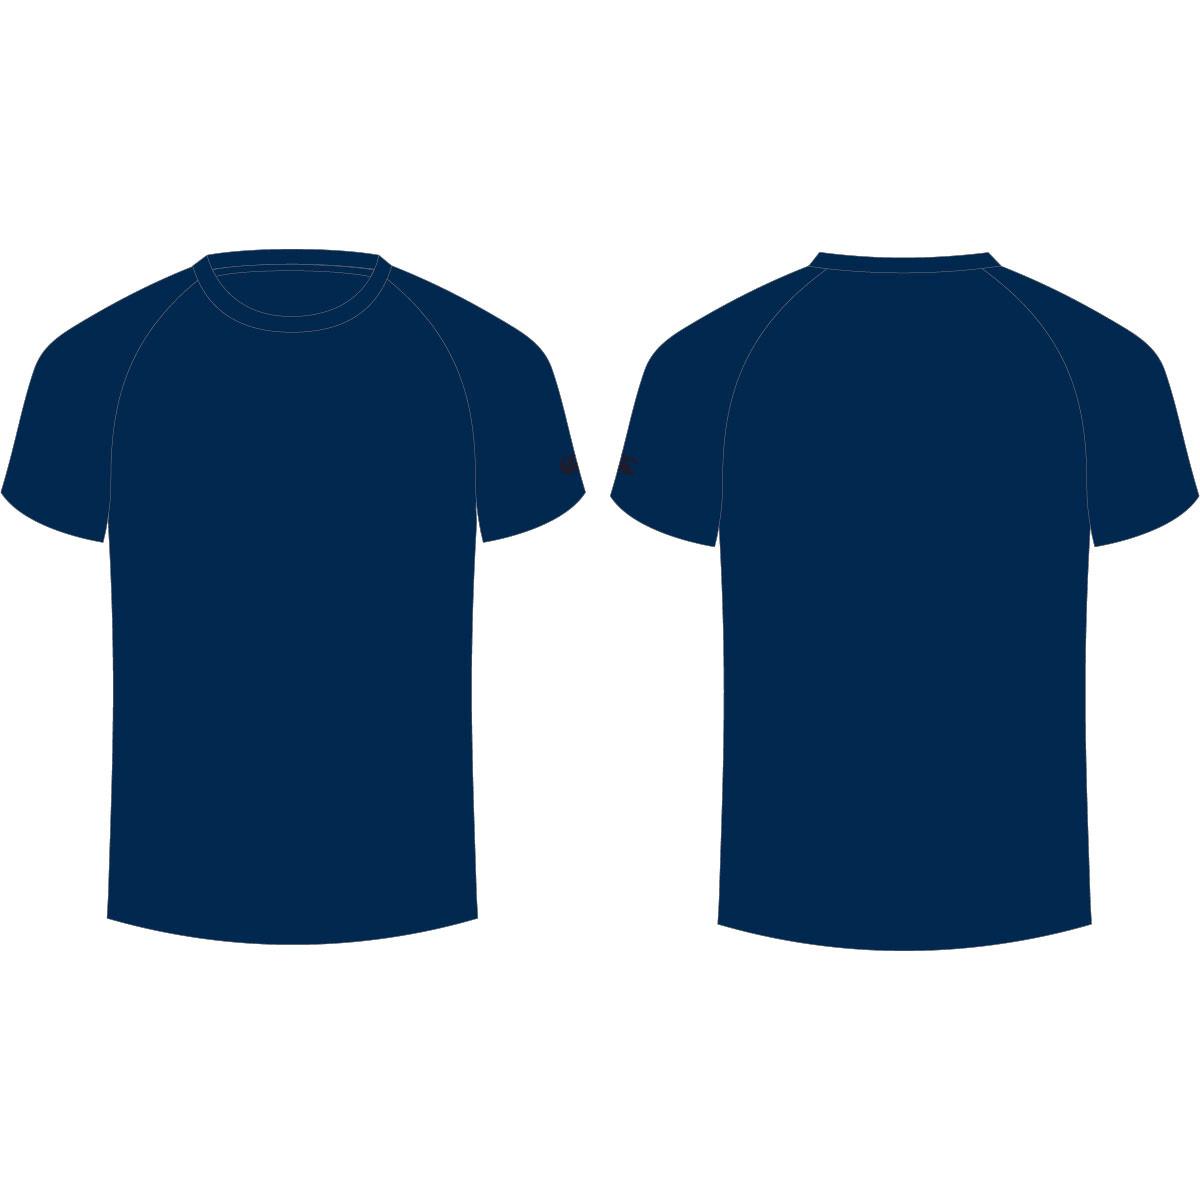 Desain Kaos Polos Warna Biru Navy Rajasthan Board F